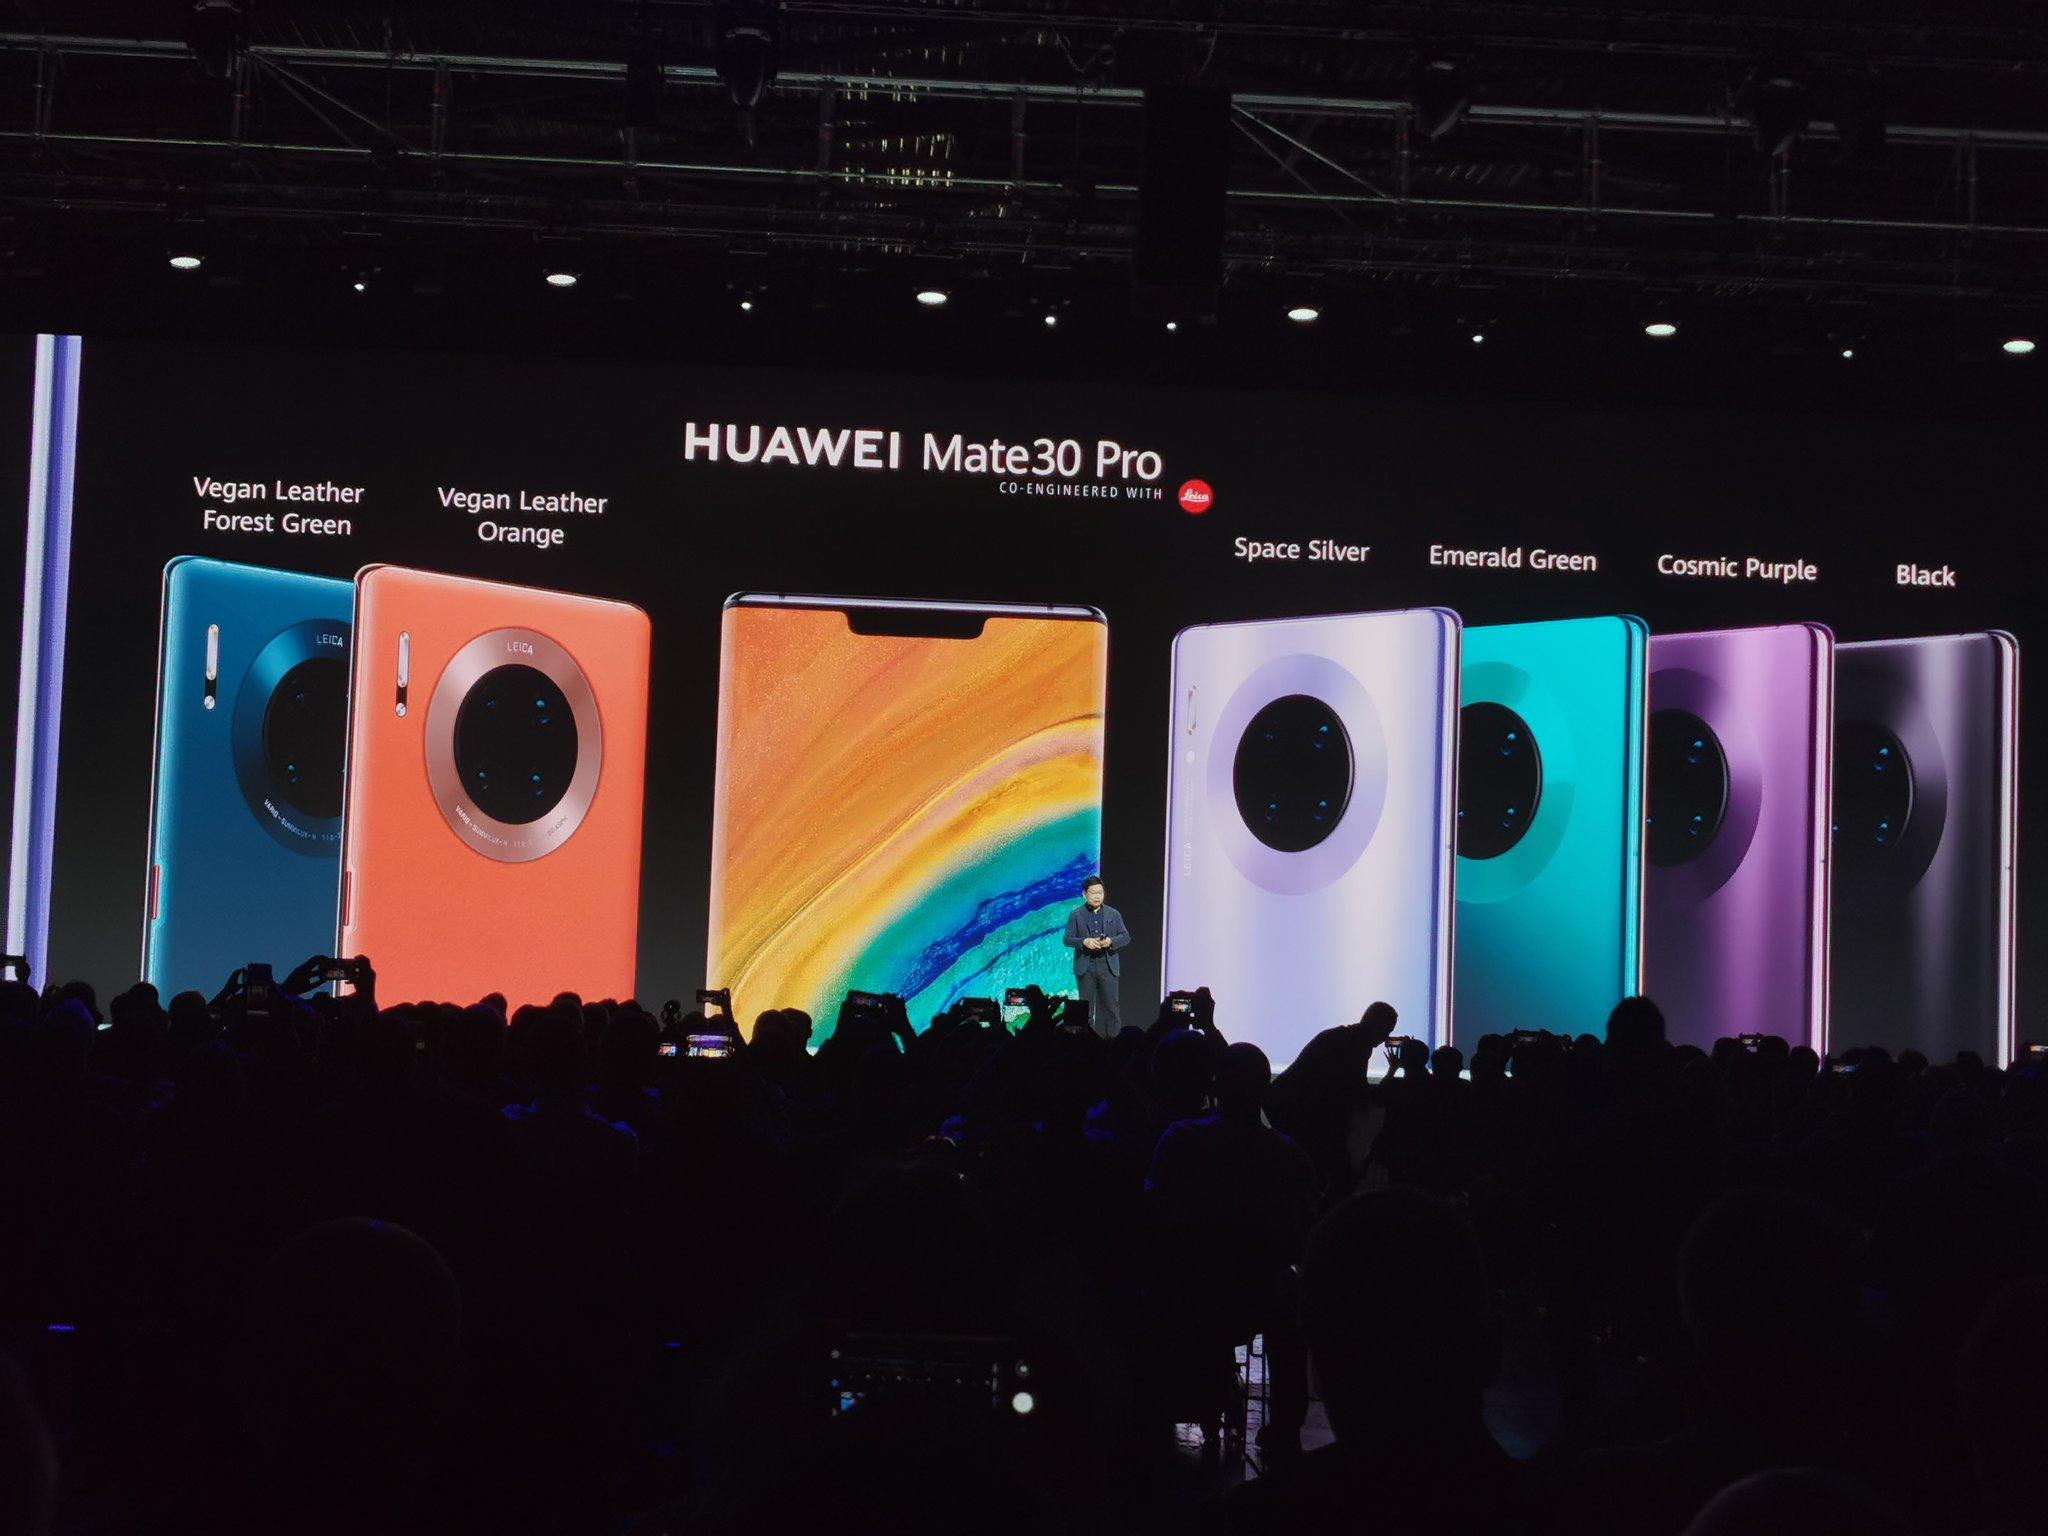 La gama de colores del Huawei Mate 30 Pro